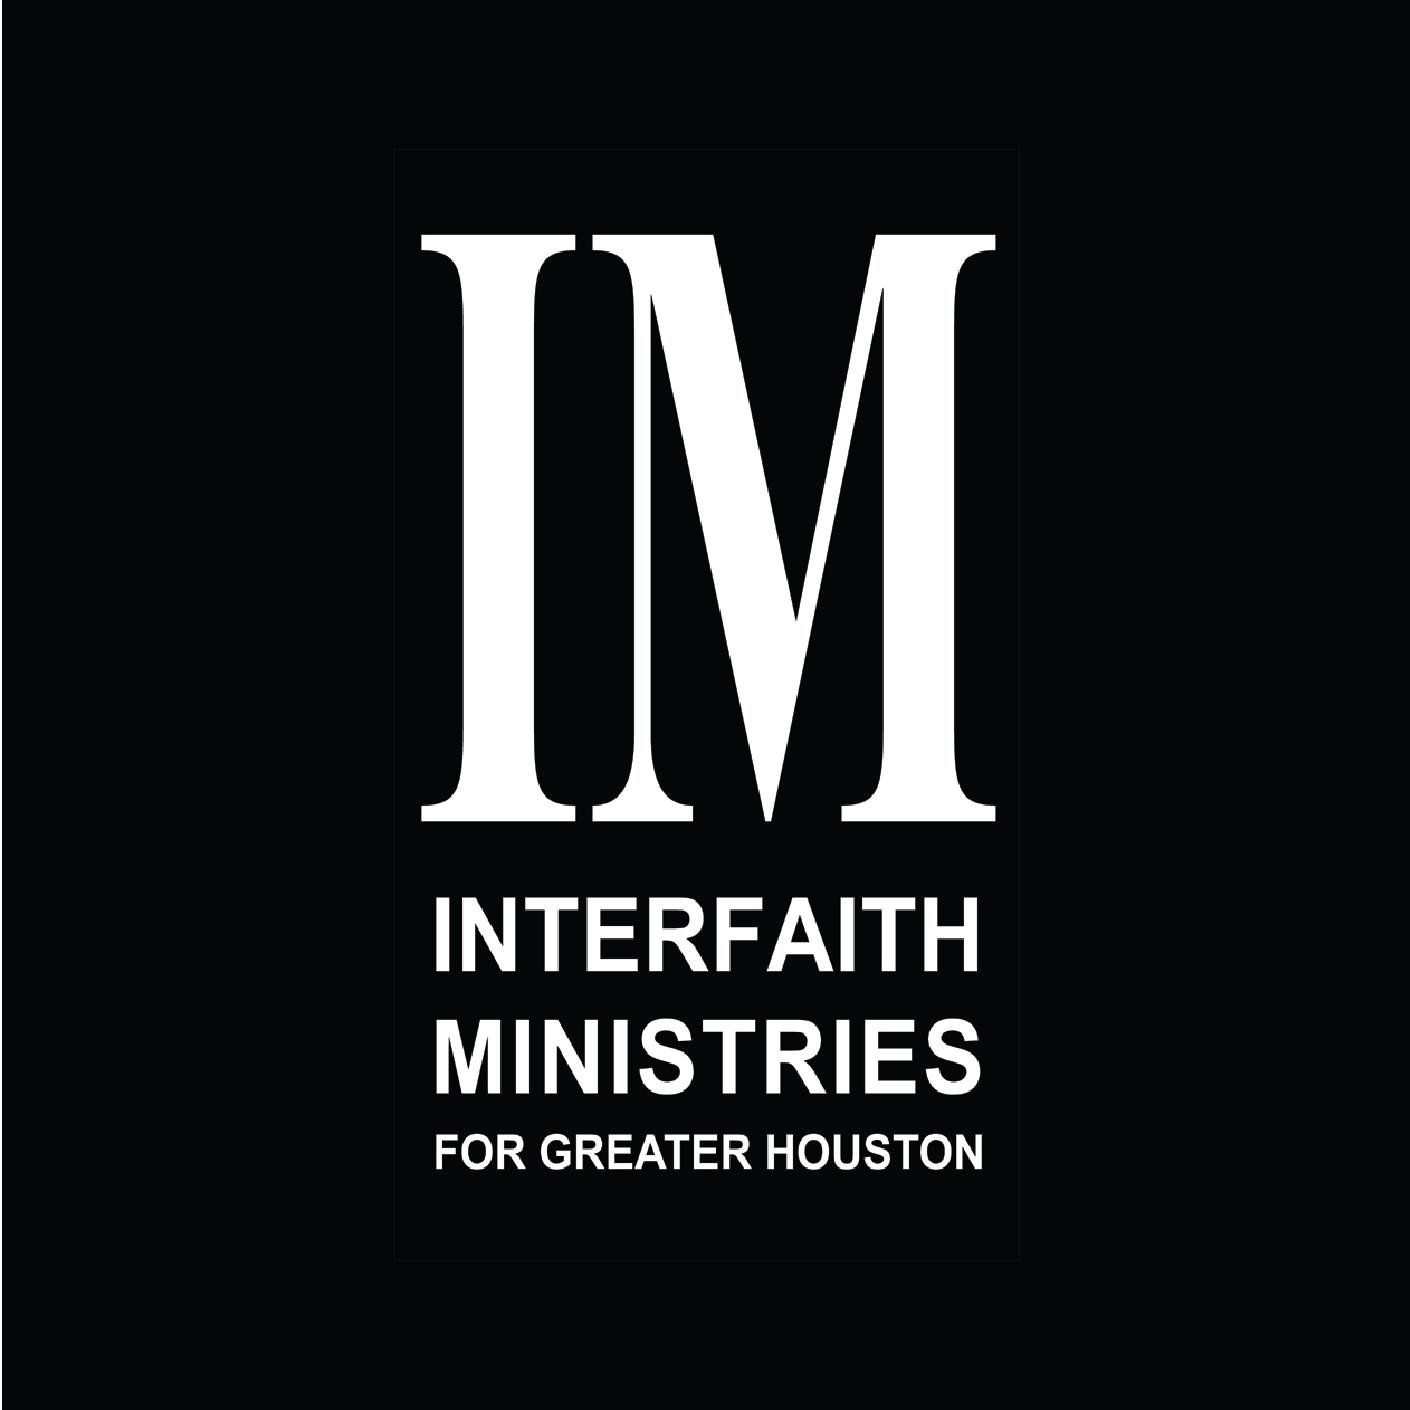 InterFaith Ministries@3x.png